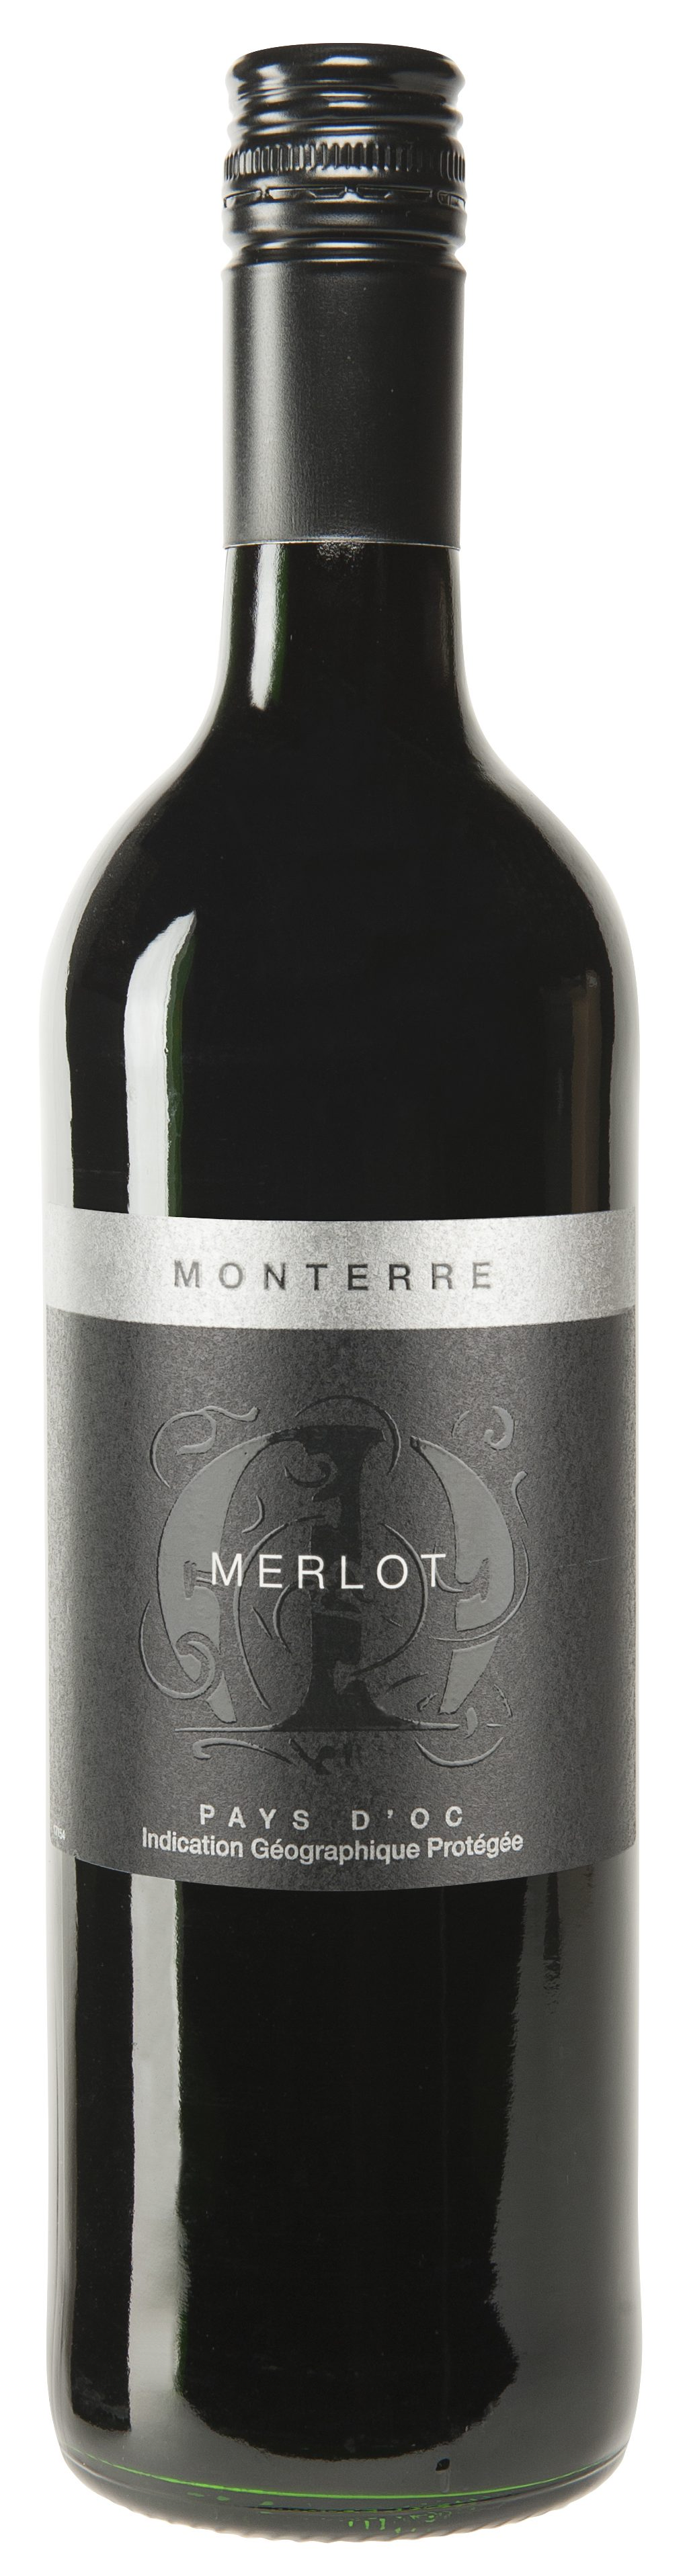 Monterre, Merlot